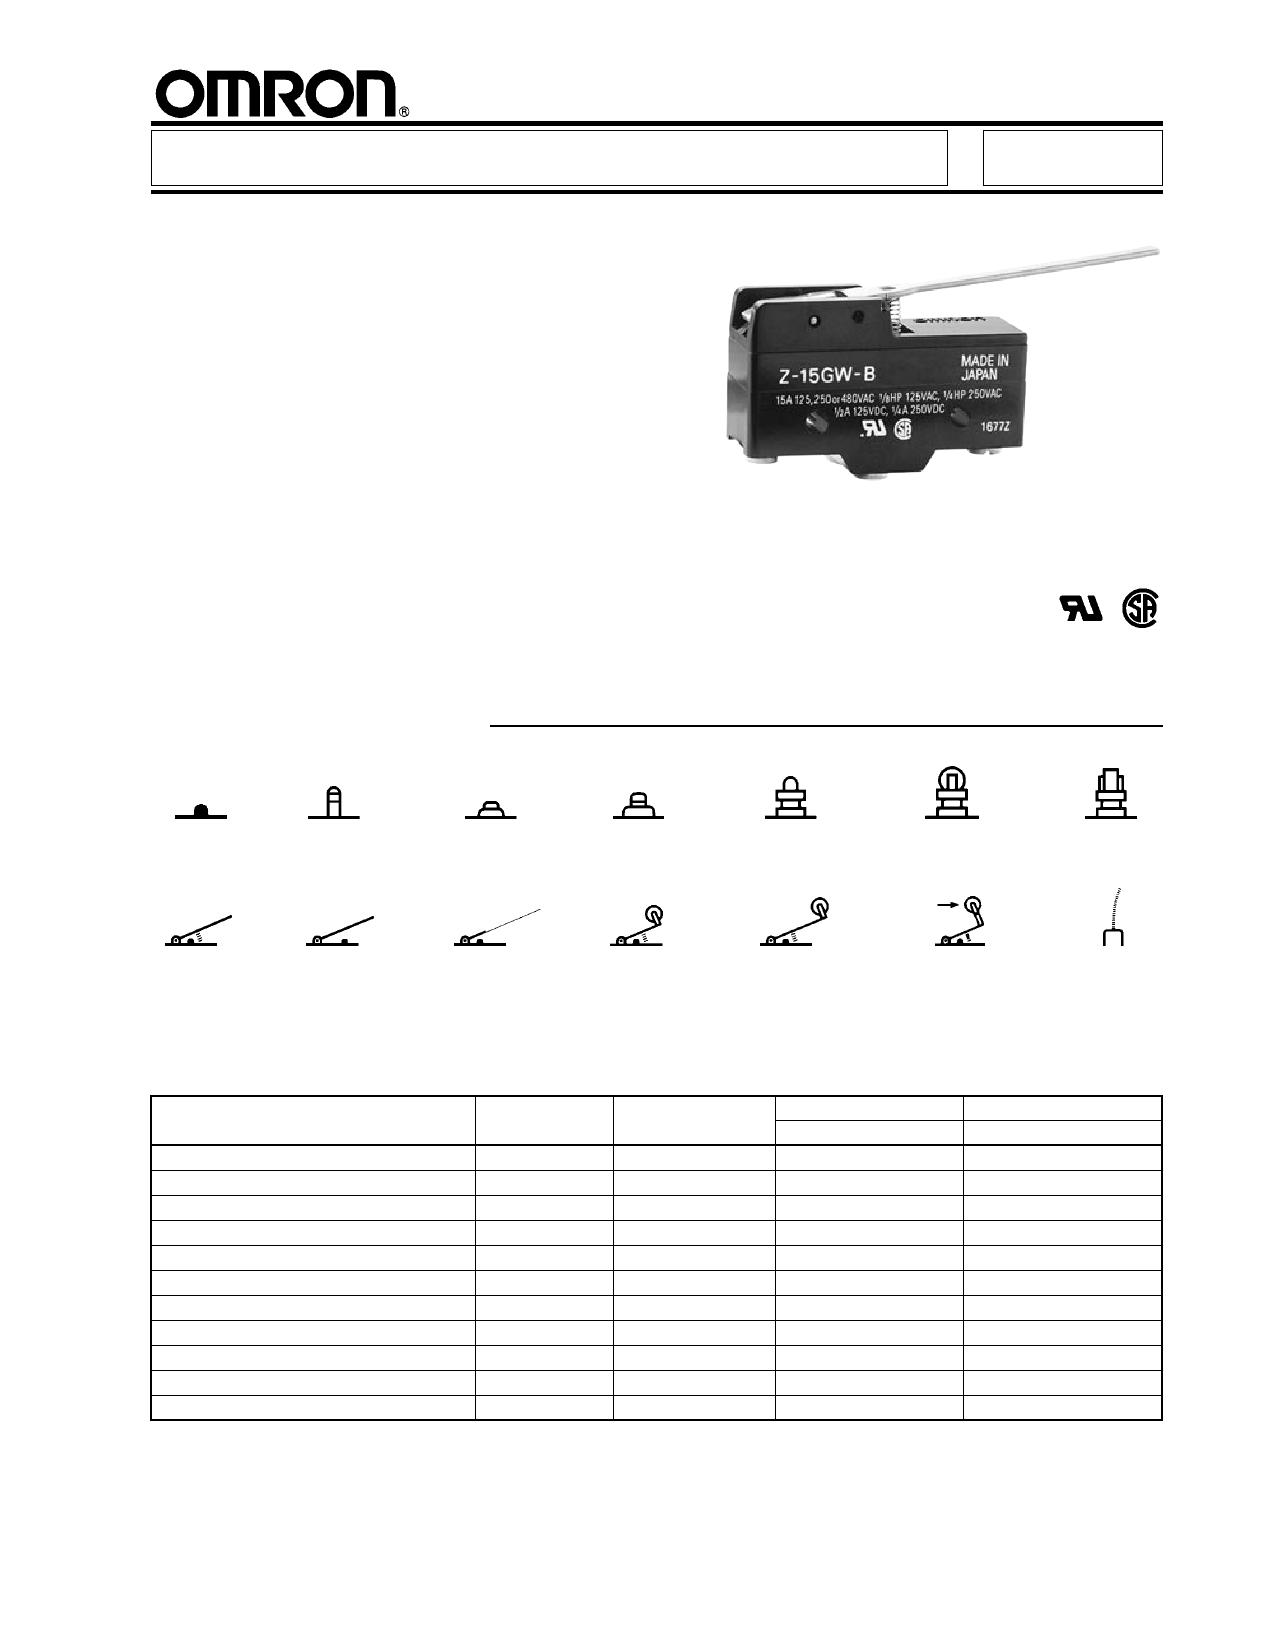 Z-15GW2 datasheet